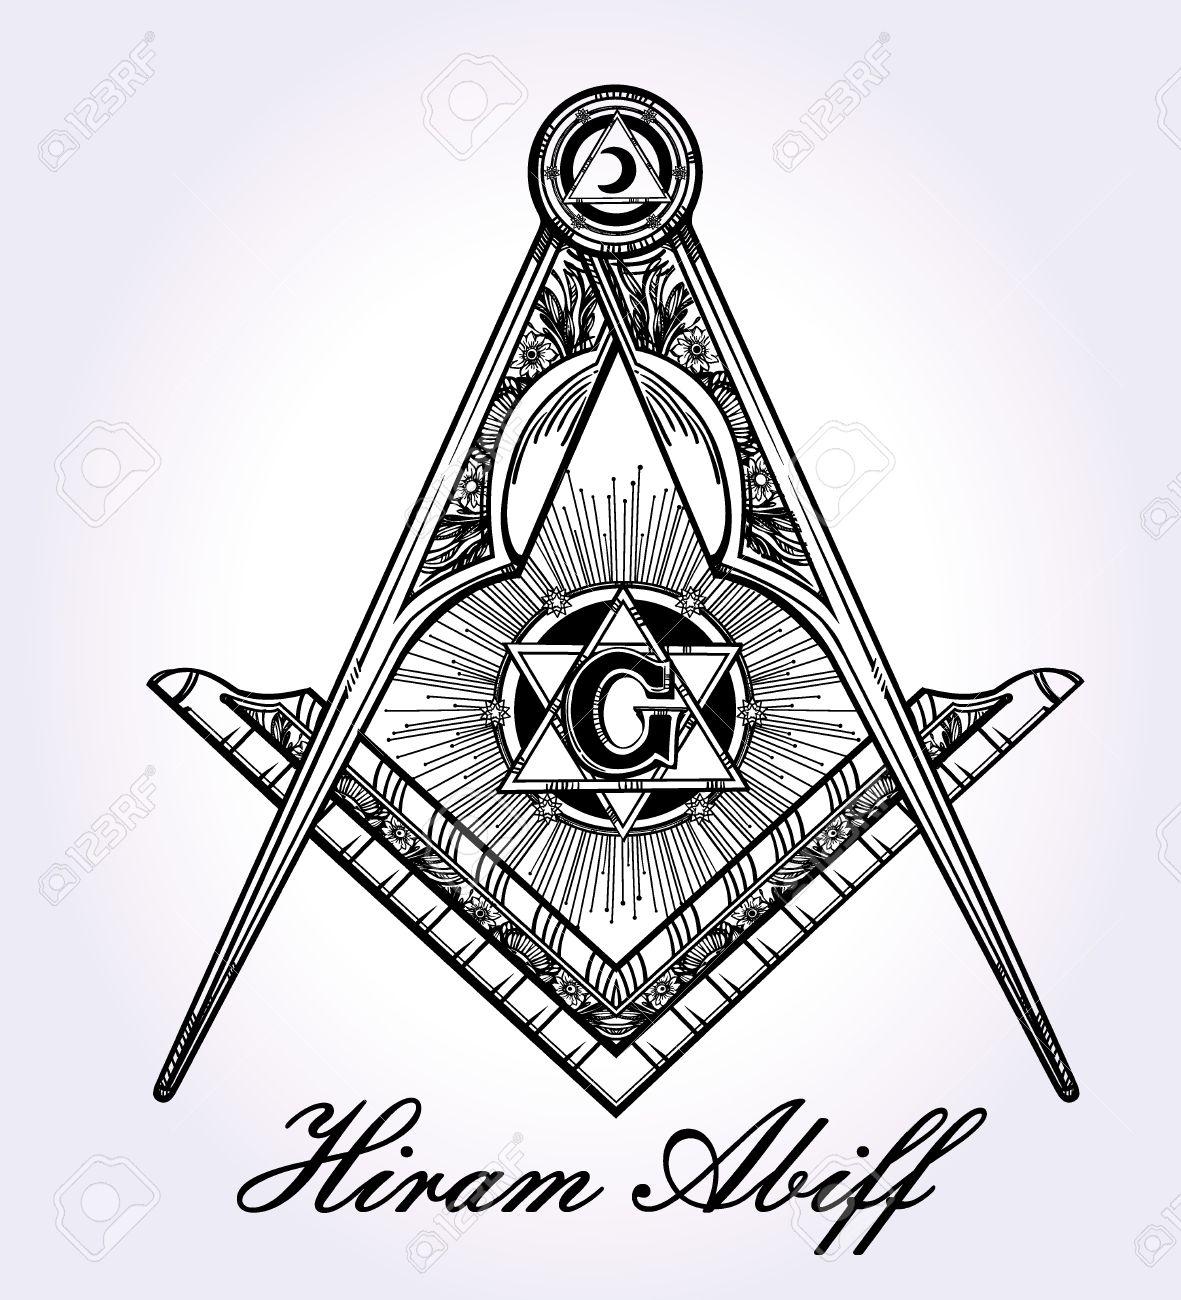 1181x1300 Freemasonry Emblem, Masonic Square Compass God Symbol. Trendy